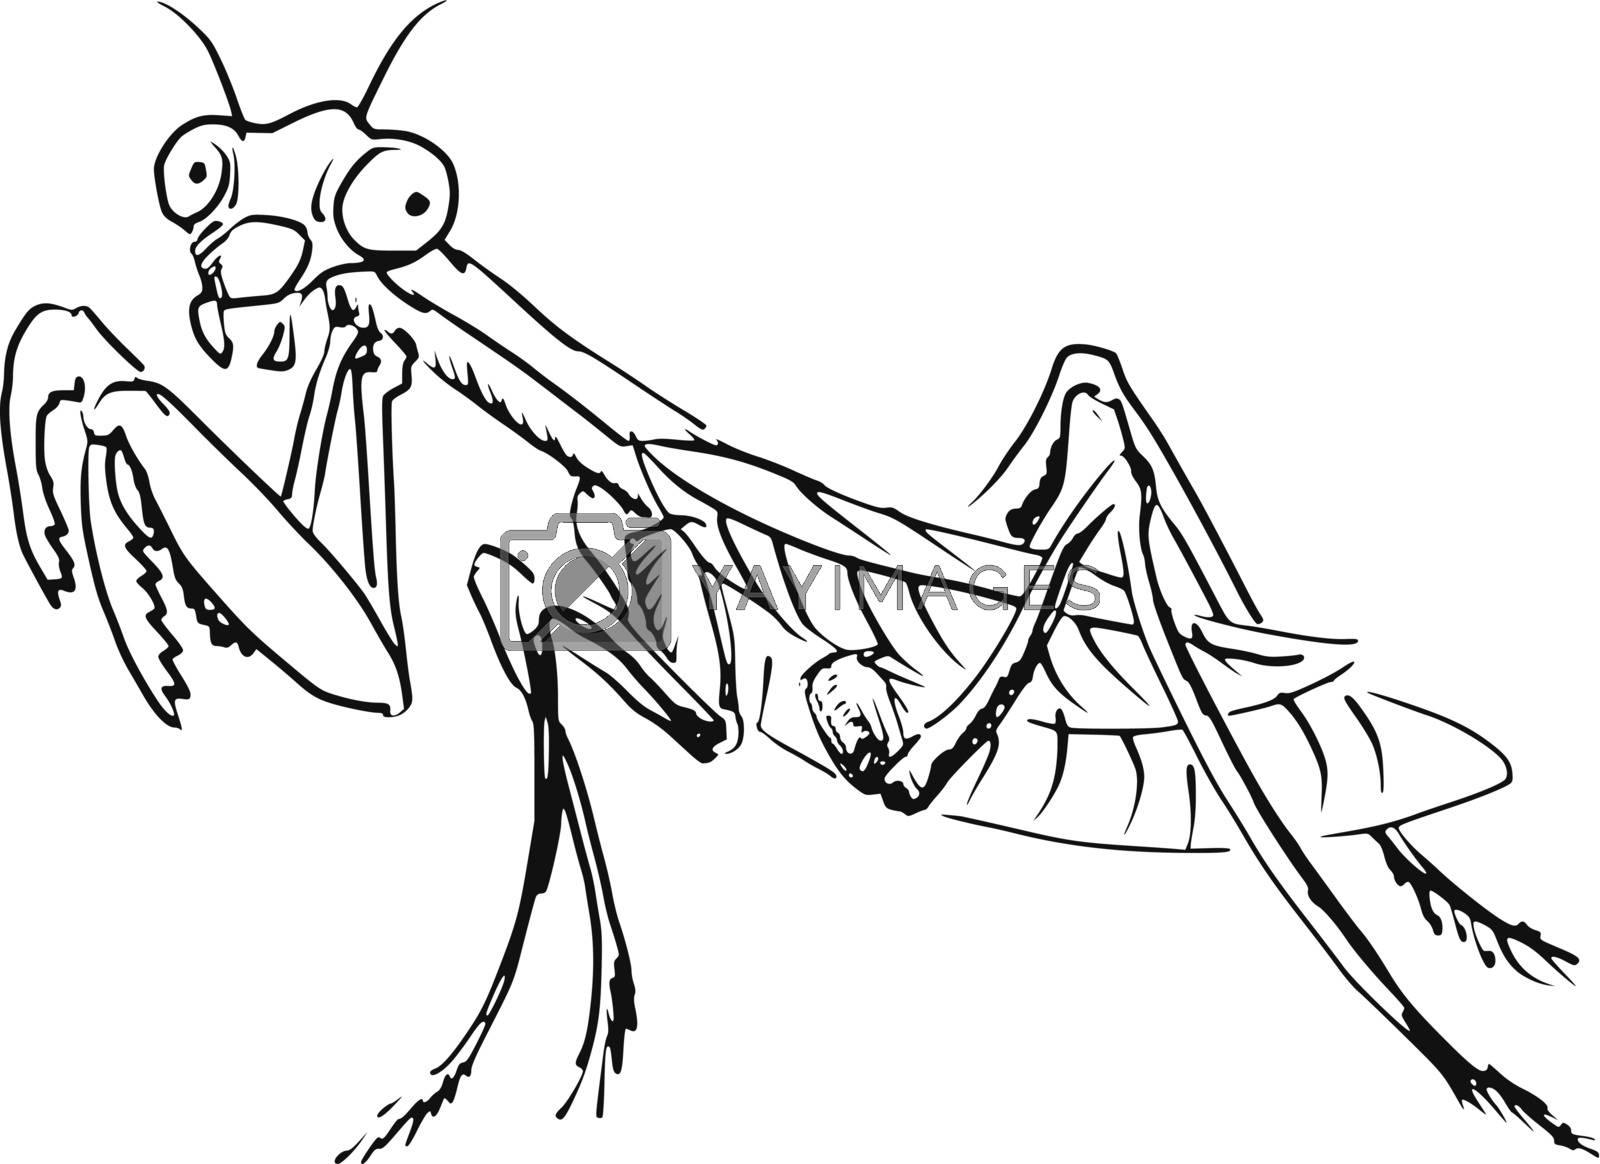 hand drawn, sketch, cartoon illustration of mantis